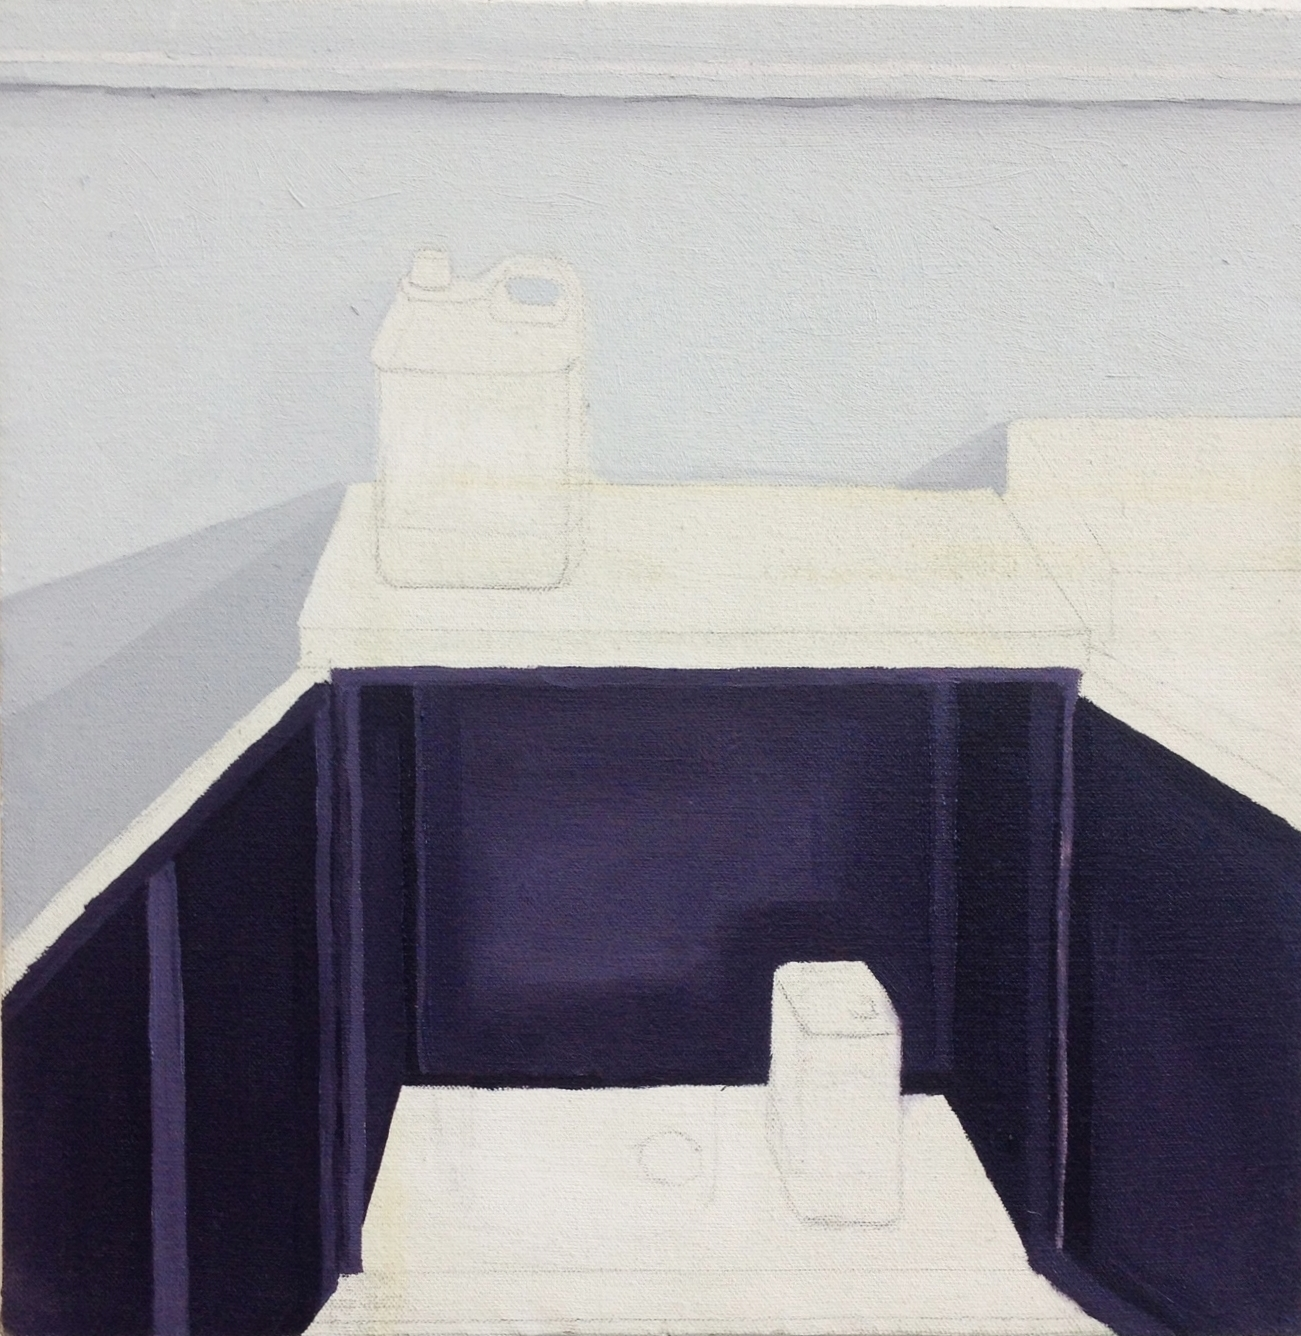 Cabinet #2